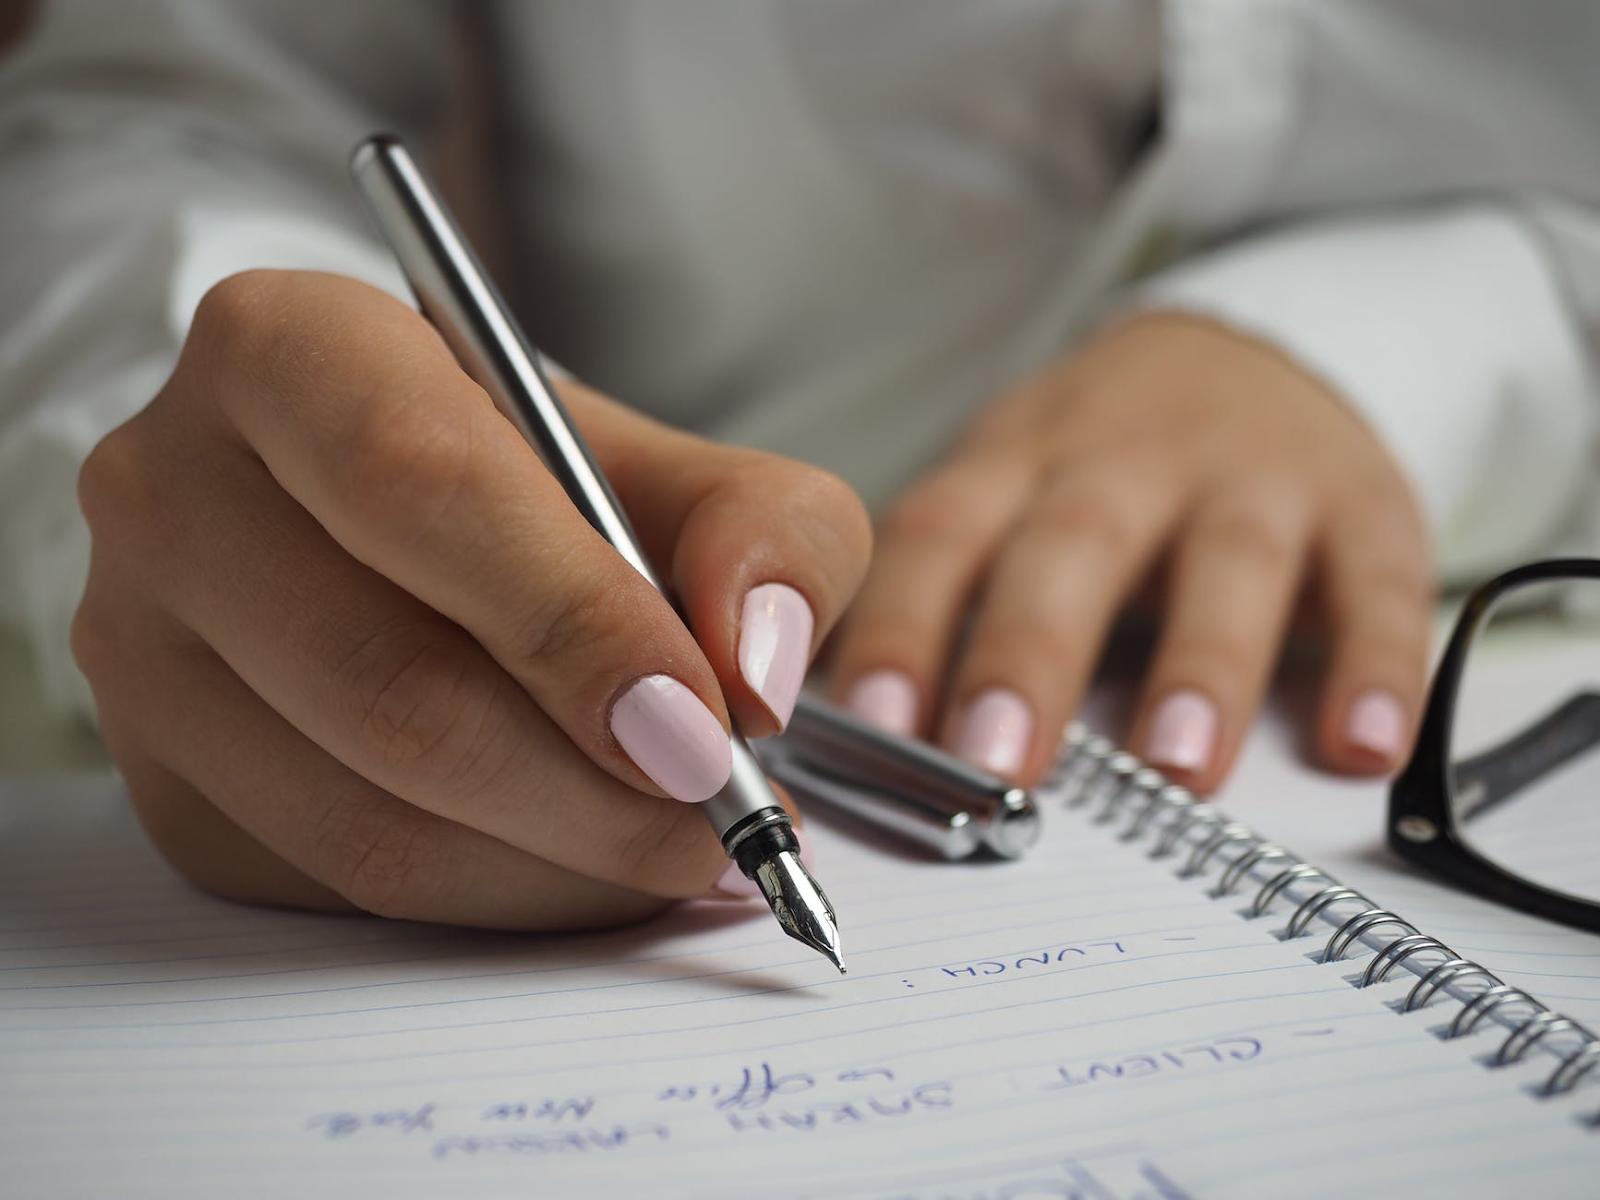 Set goals to improve work performance